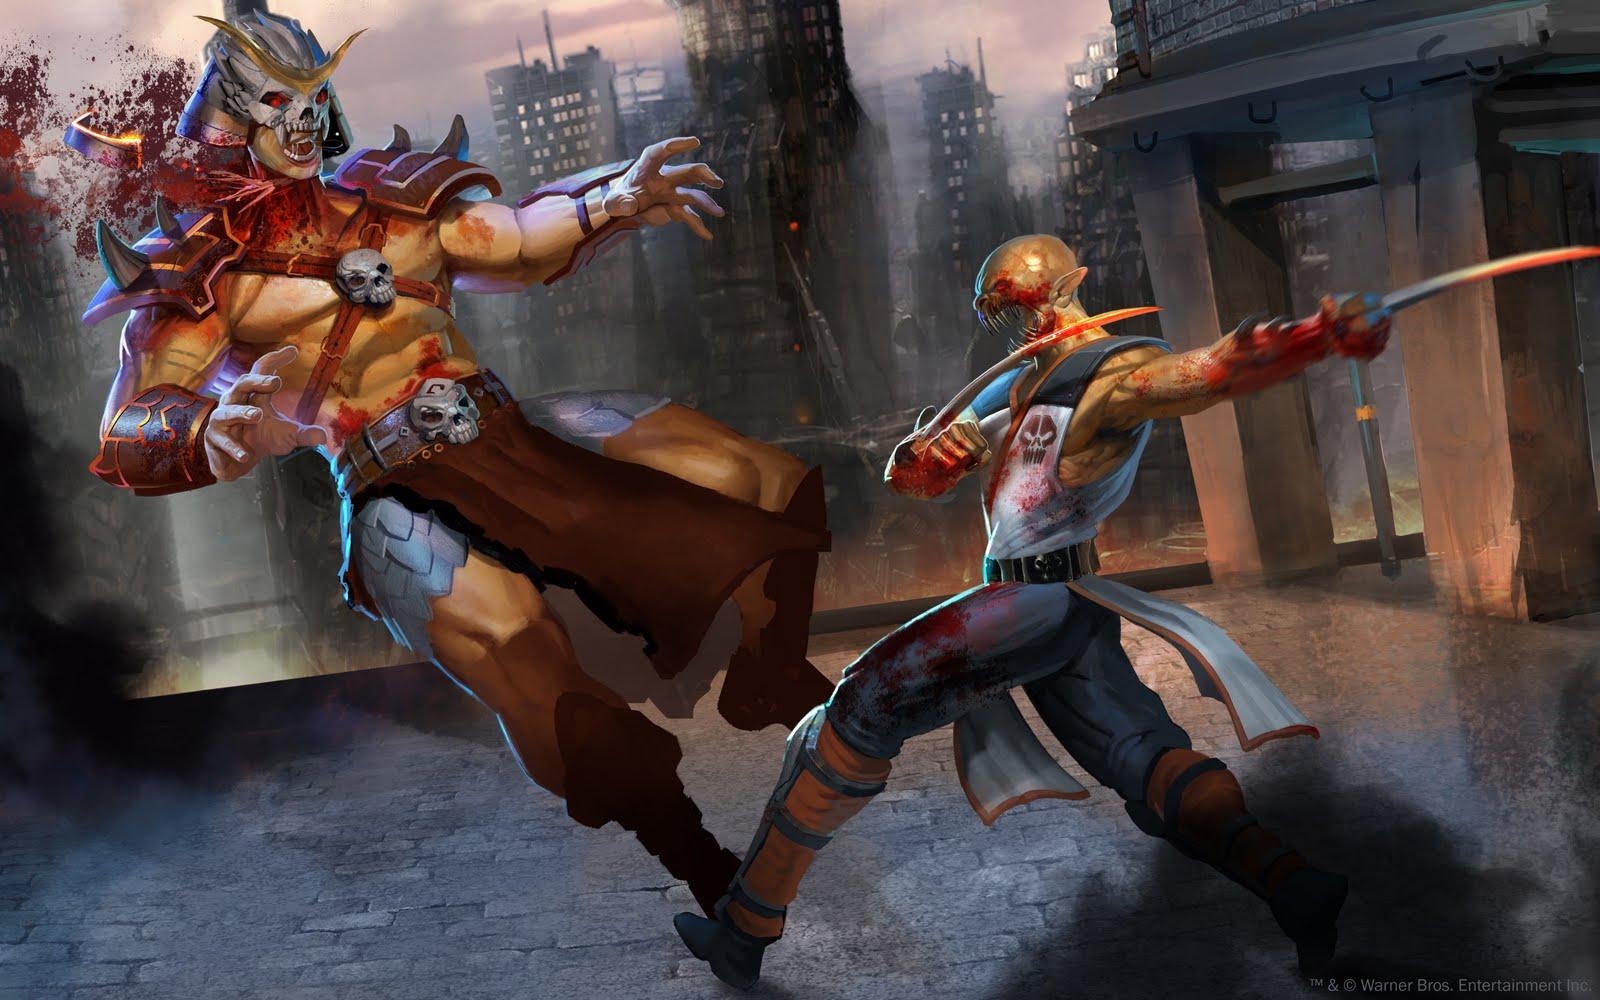 Mortal Kombat Online - Mortal Kombat (2011) - Artist site reveals a